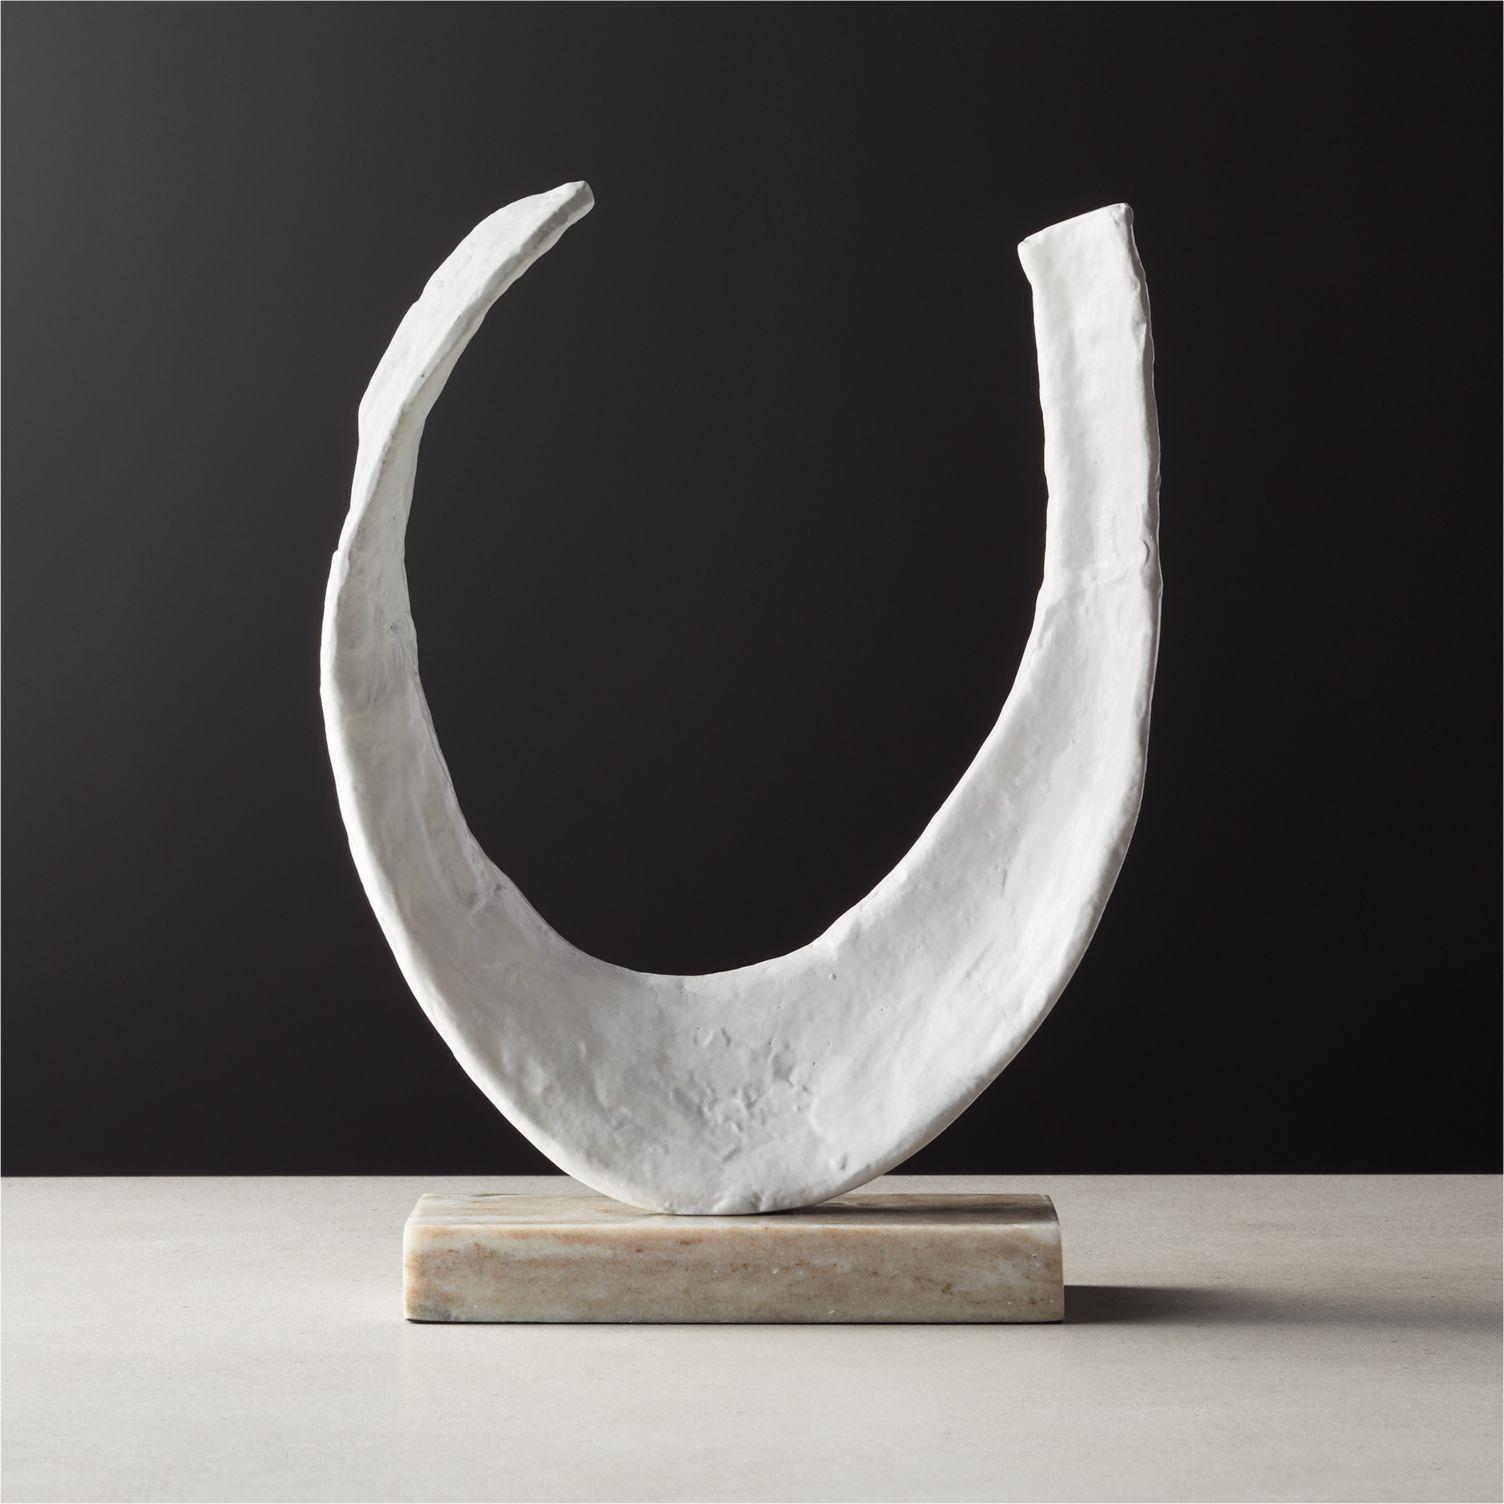 Textured aluminum sculpture from CB2